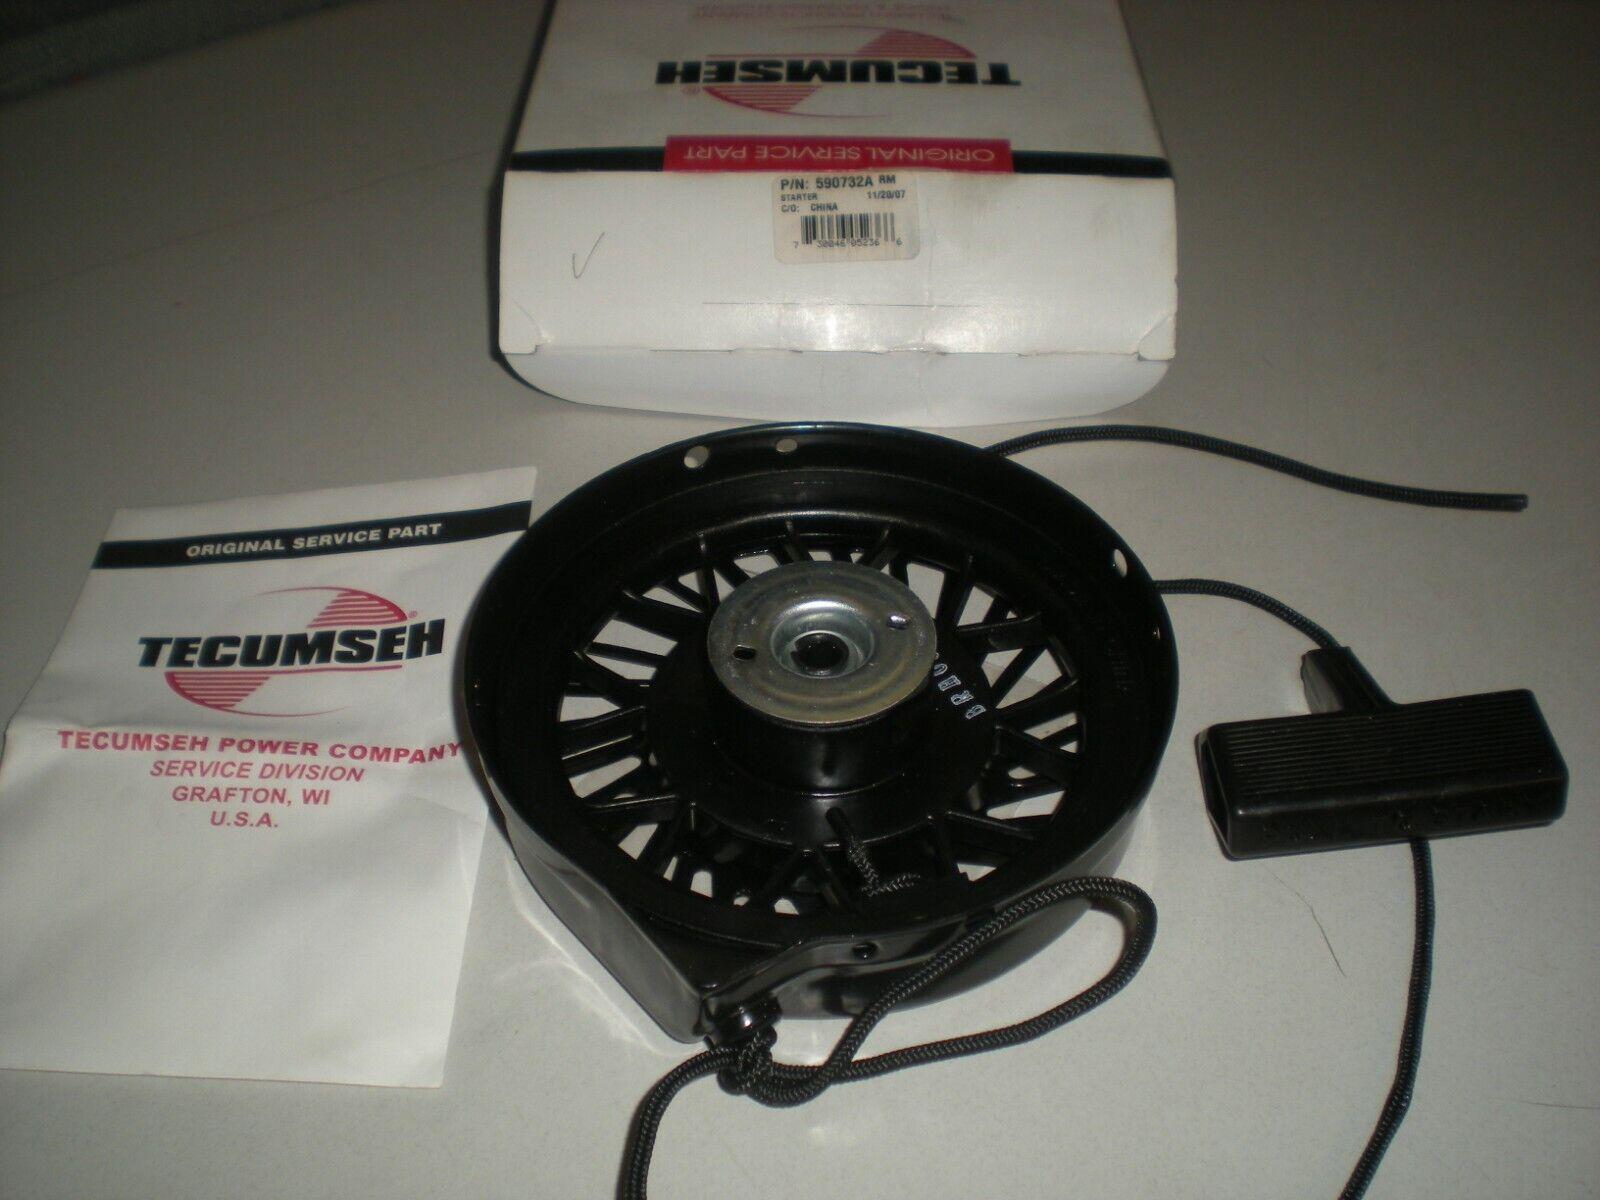 Tecumseh 590732A Retroceso-Nuevo Viejo Stock